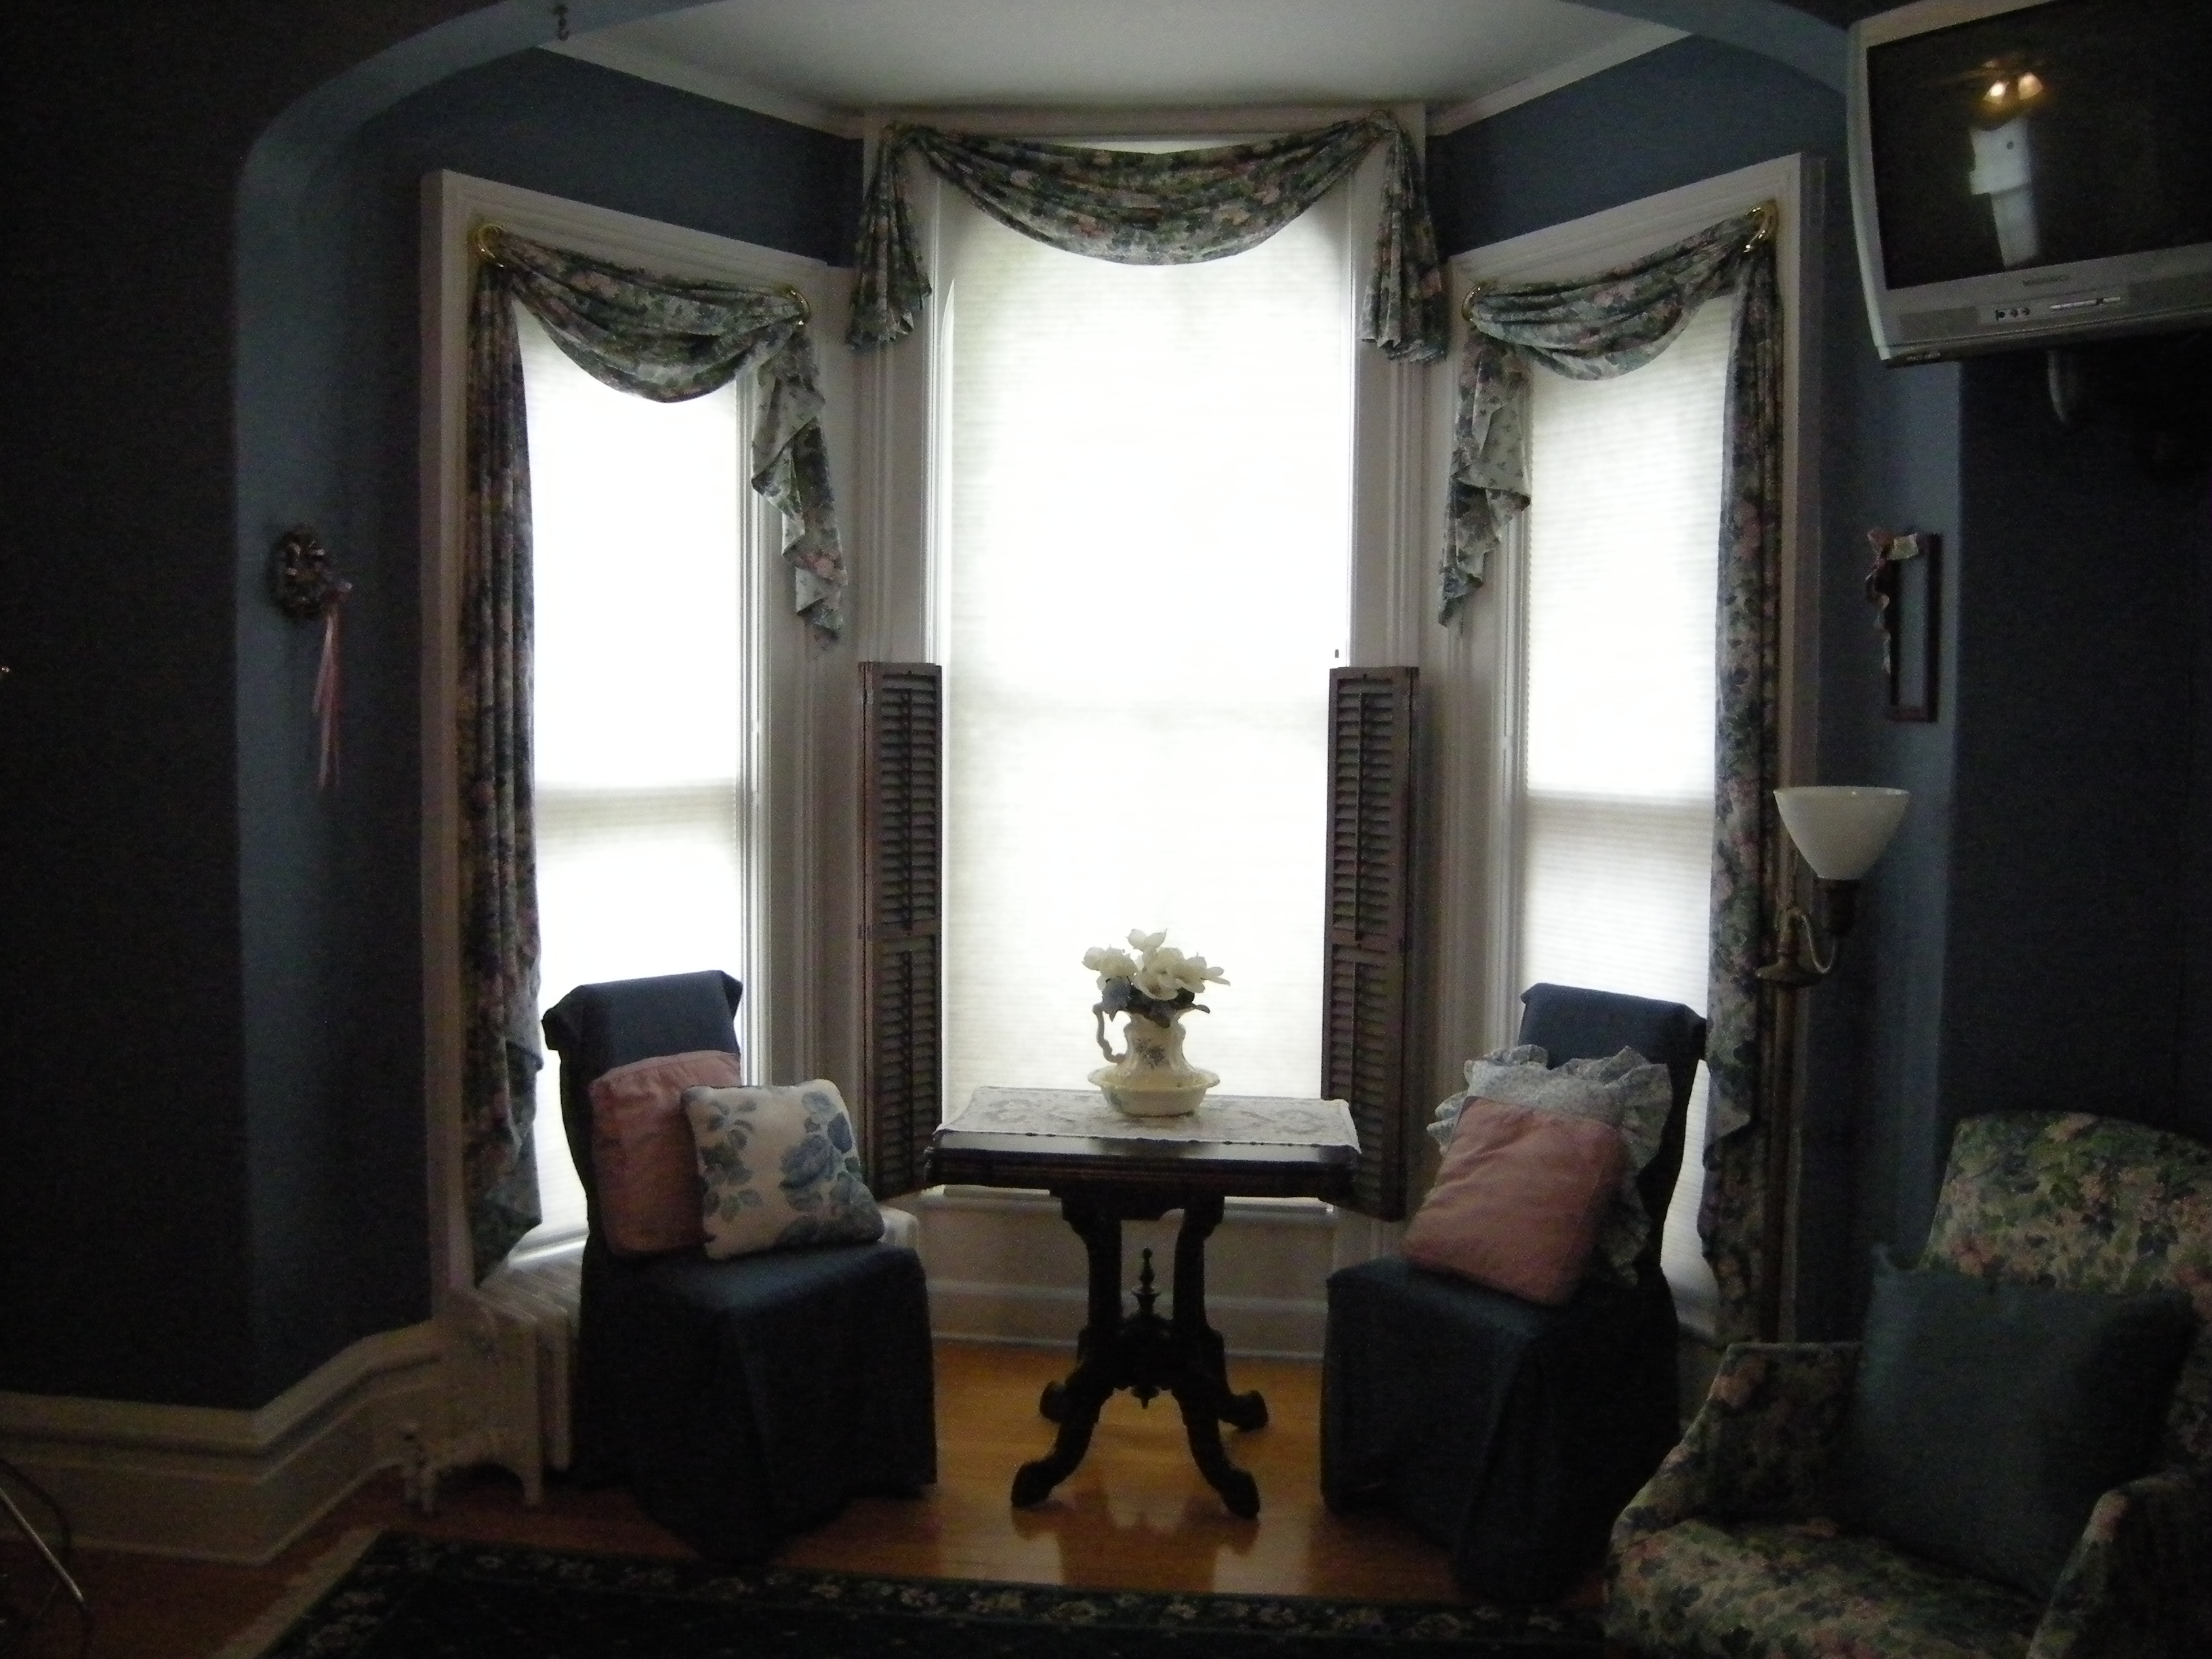 Airbnb Alternative Property in Saratoga Springs